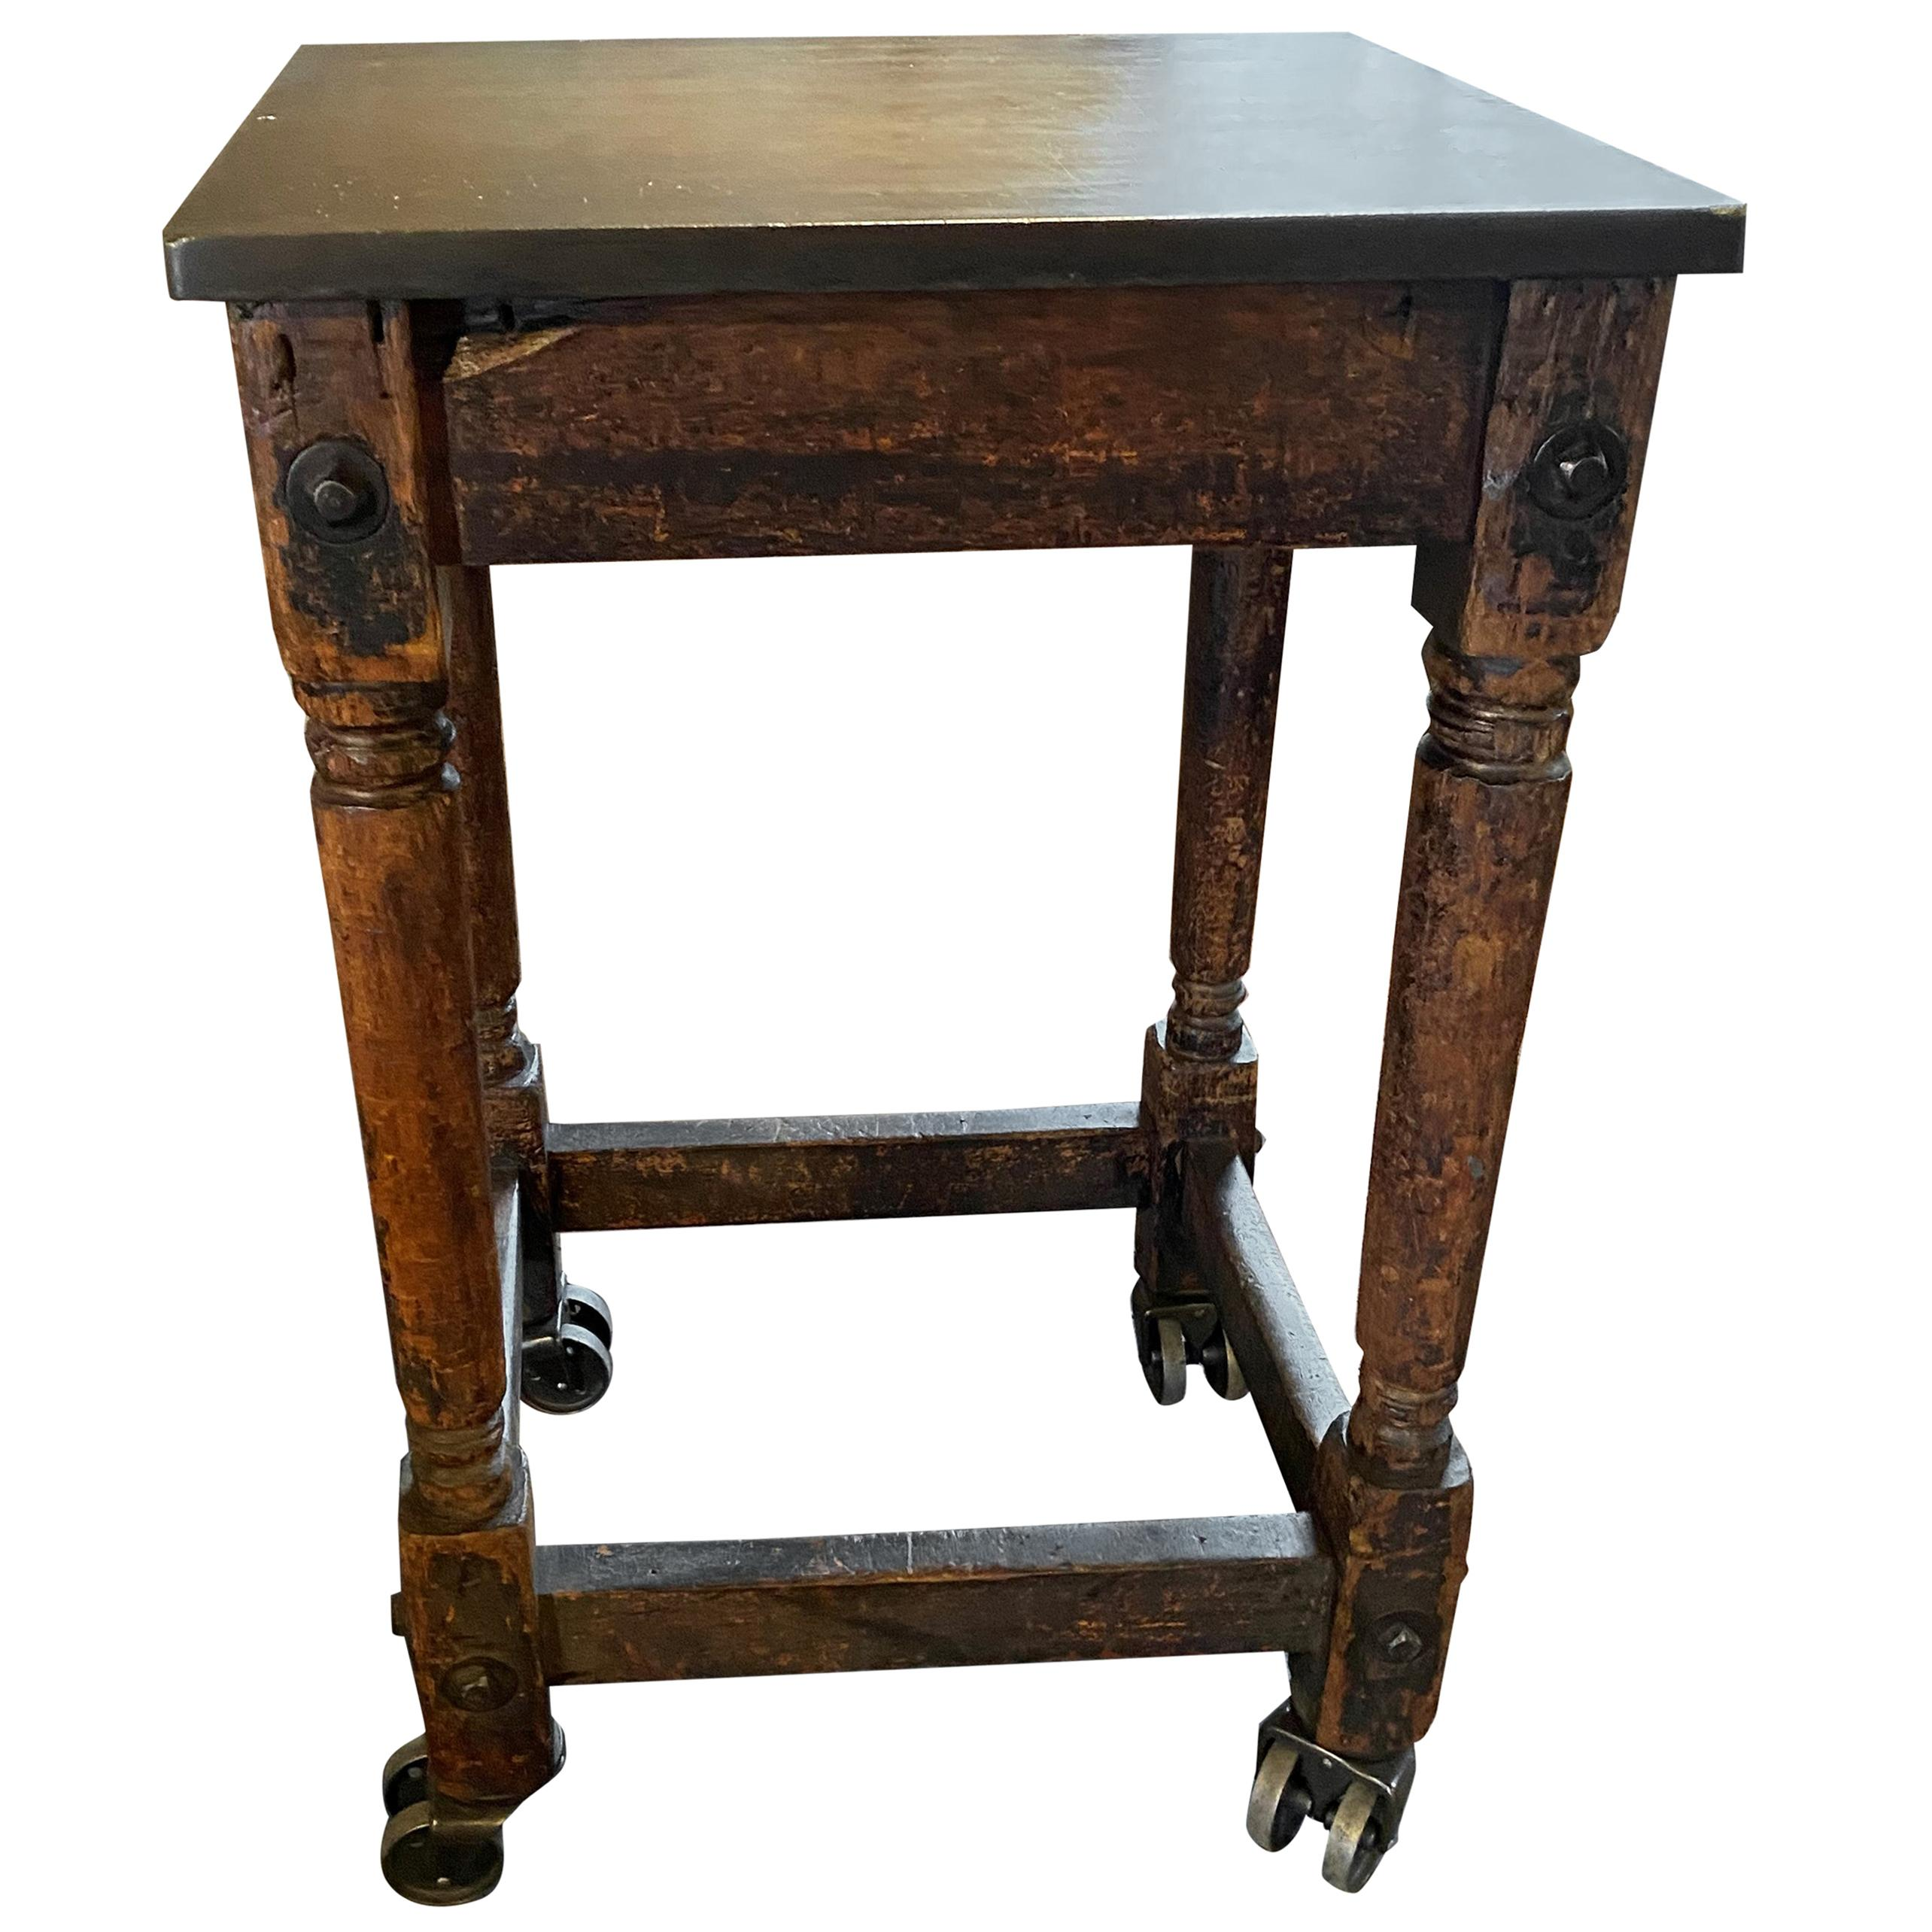 Vintage Industrial Table / Island Cart